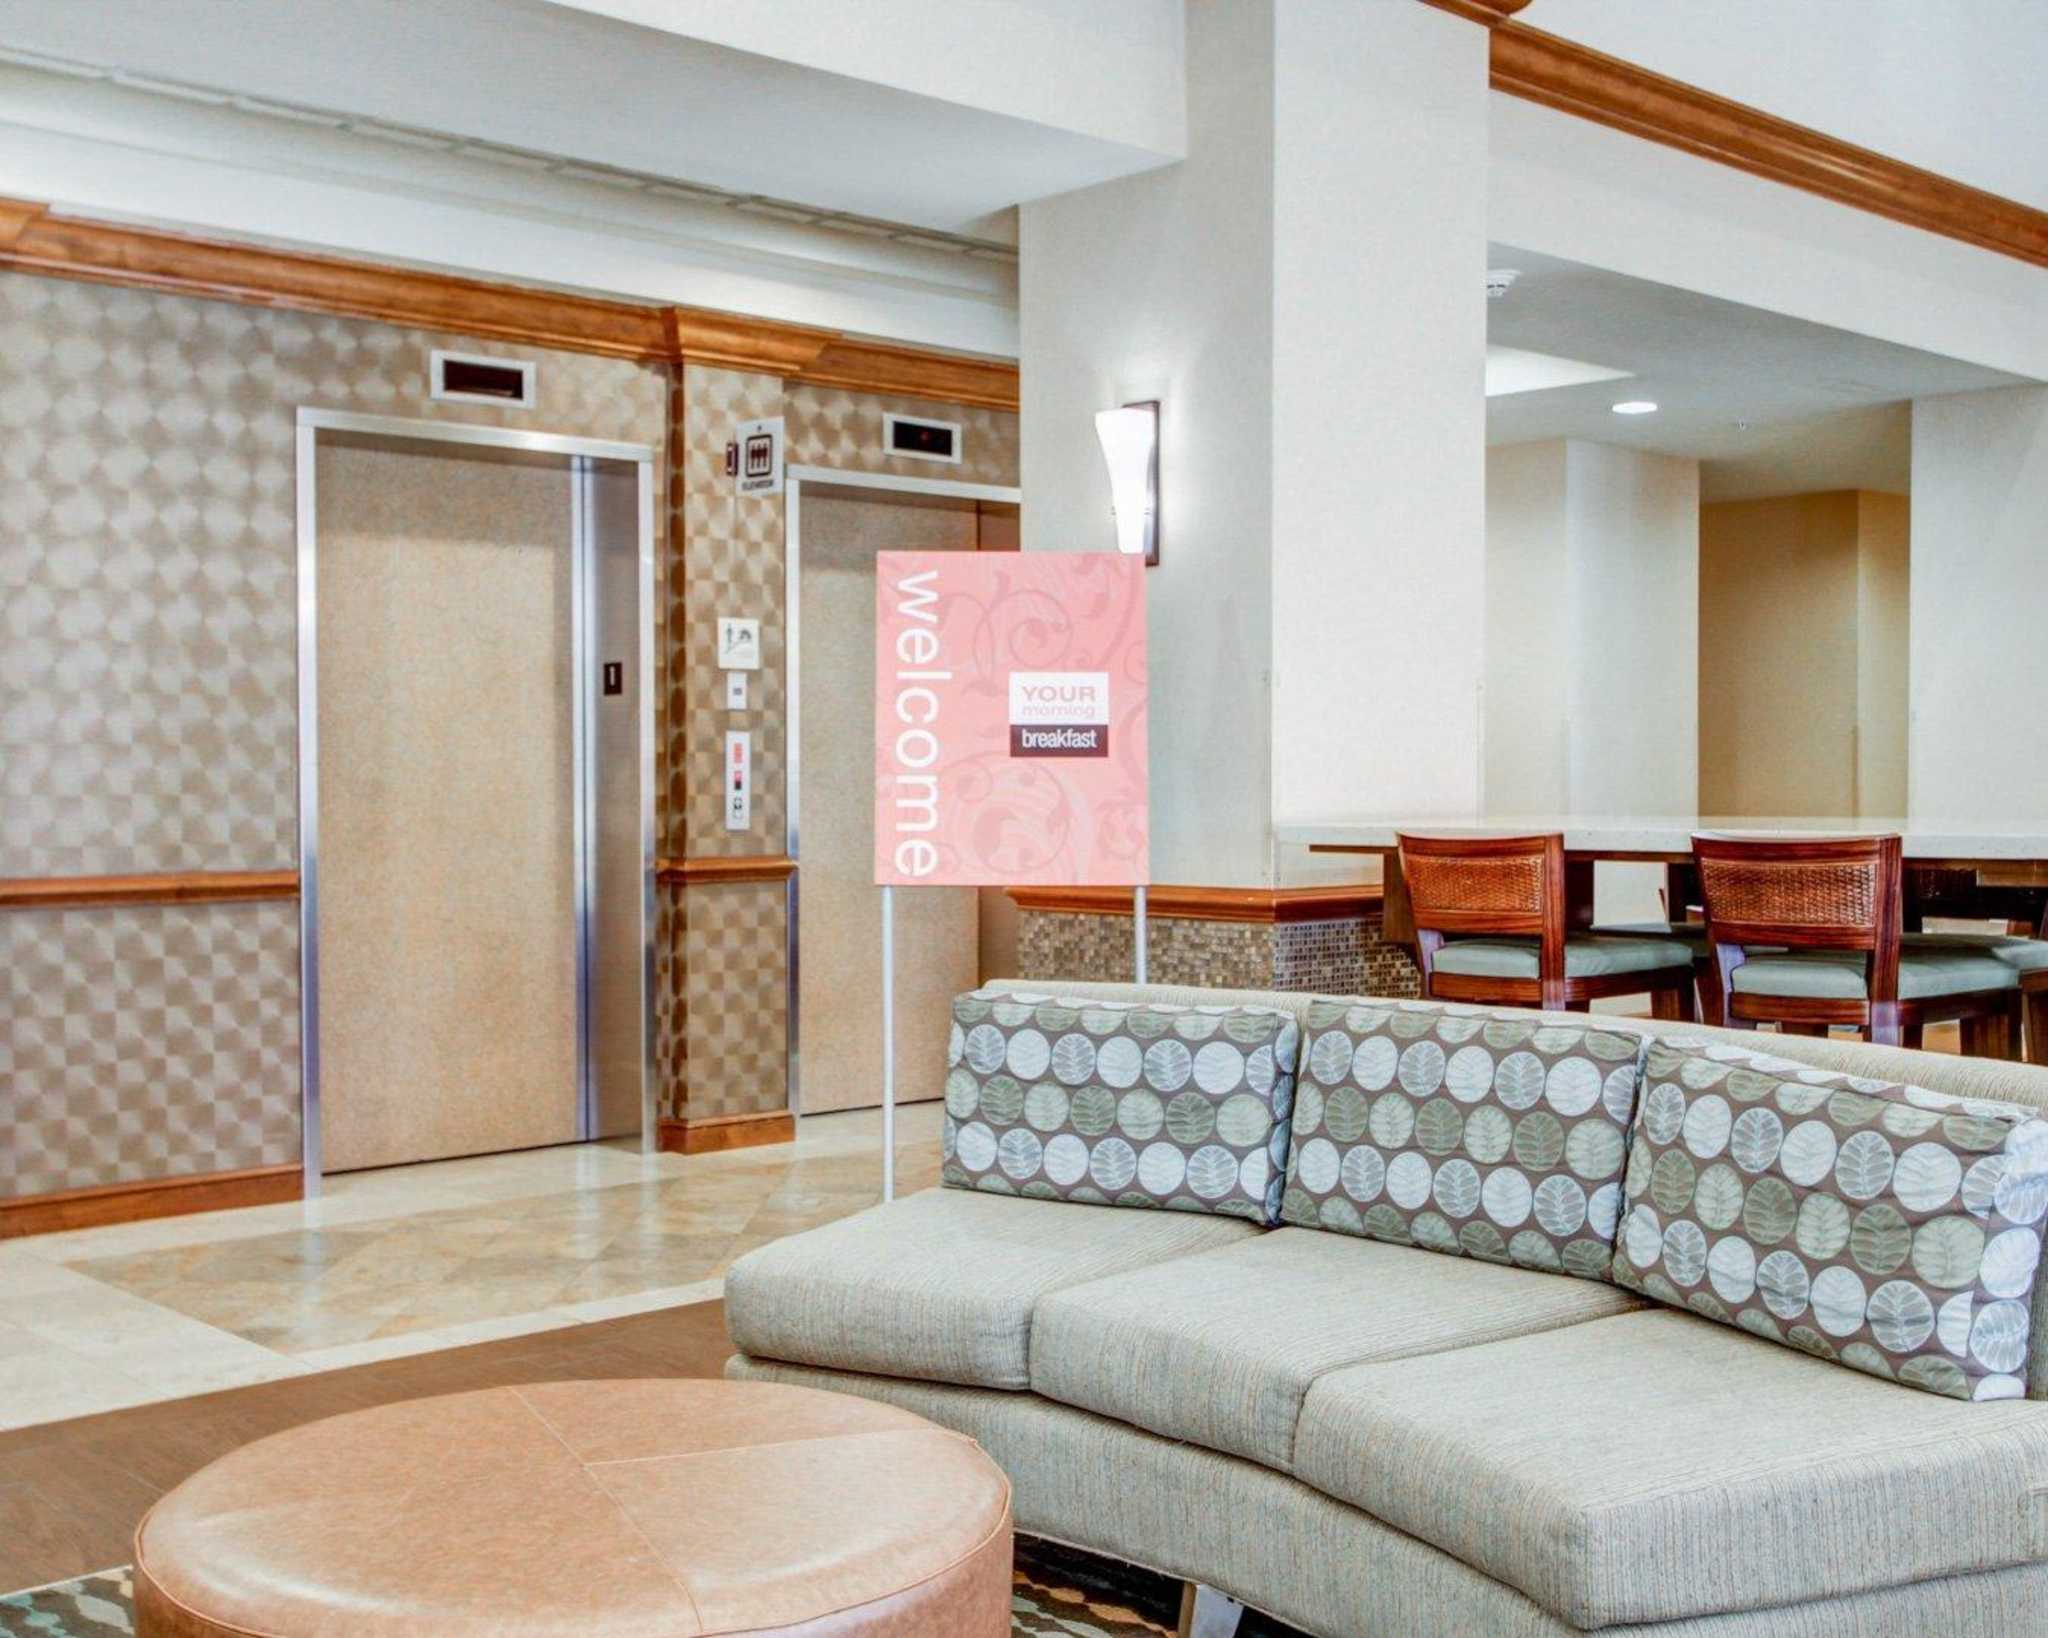 Comfort Suites Weston - Sawgrass Mills South image 11